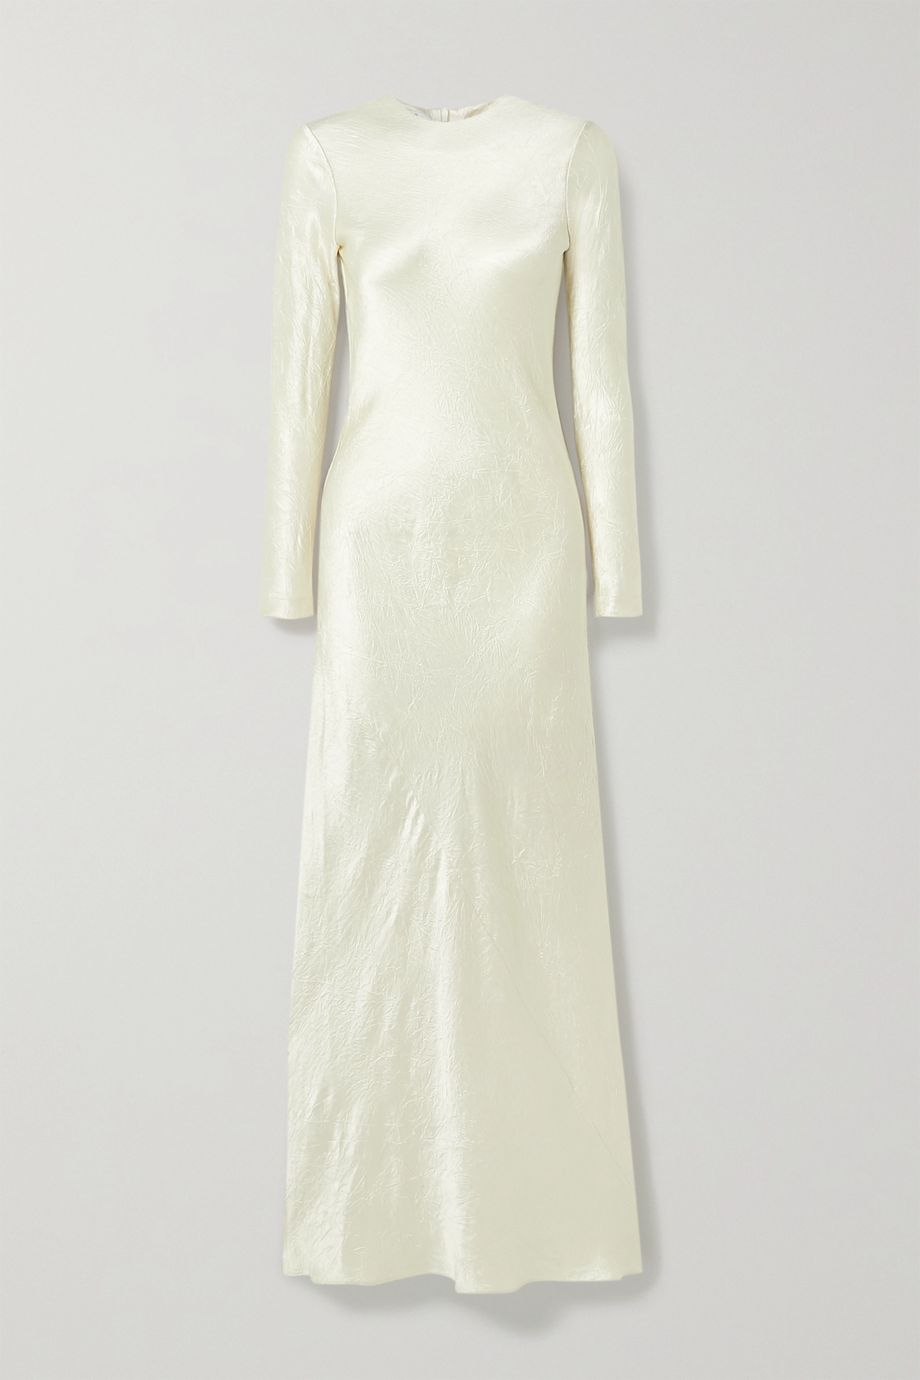 Co Crinkled-satin maxi dress